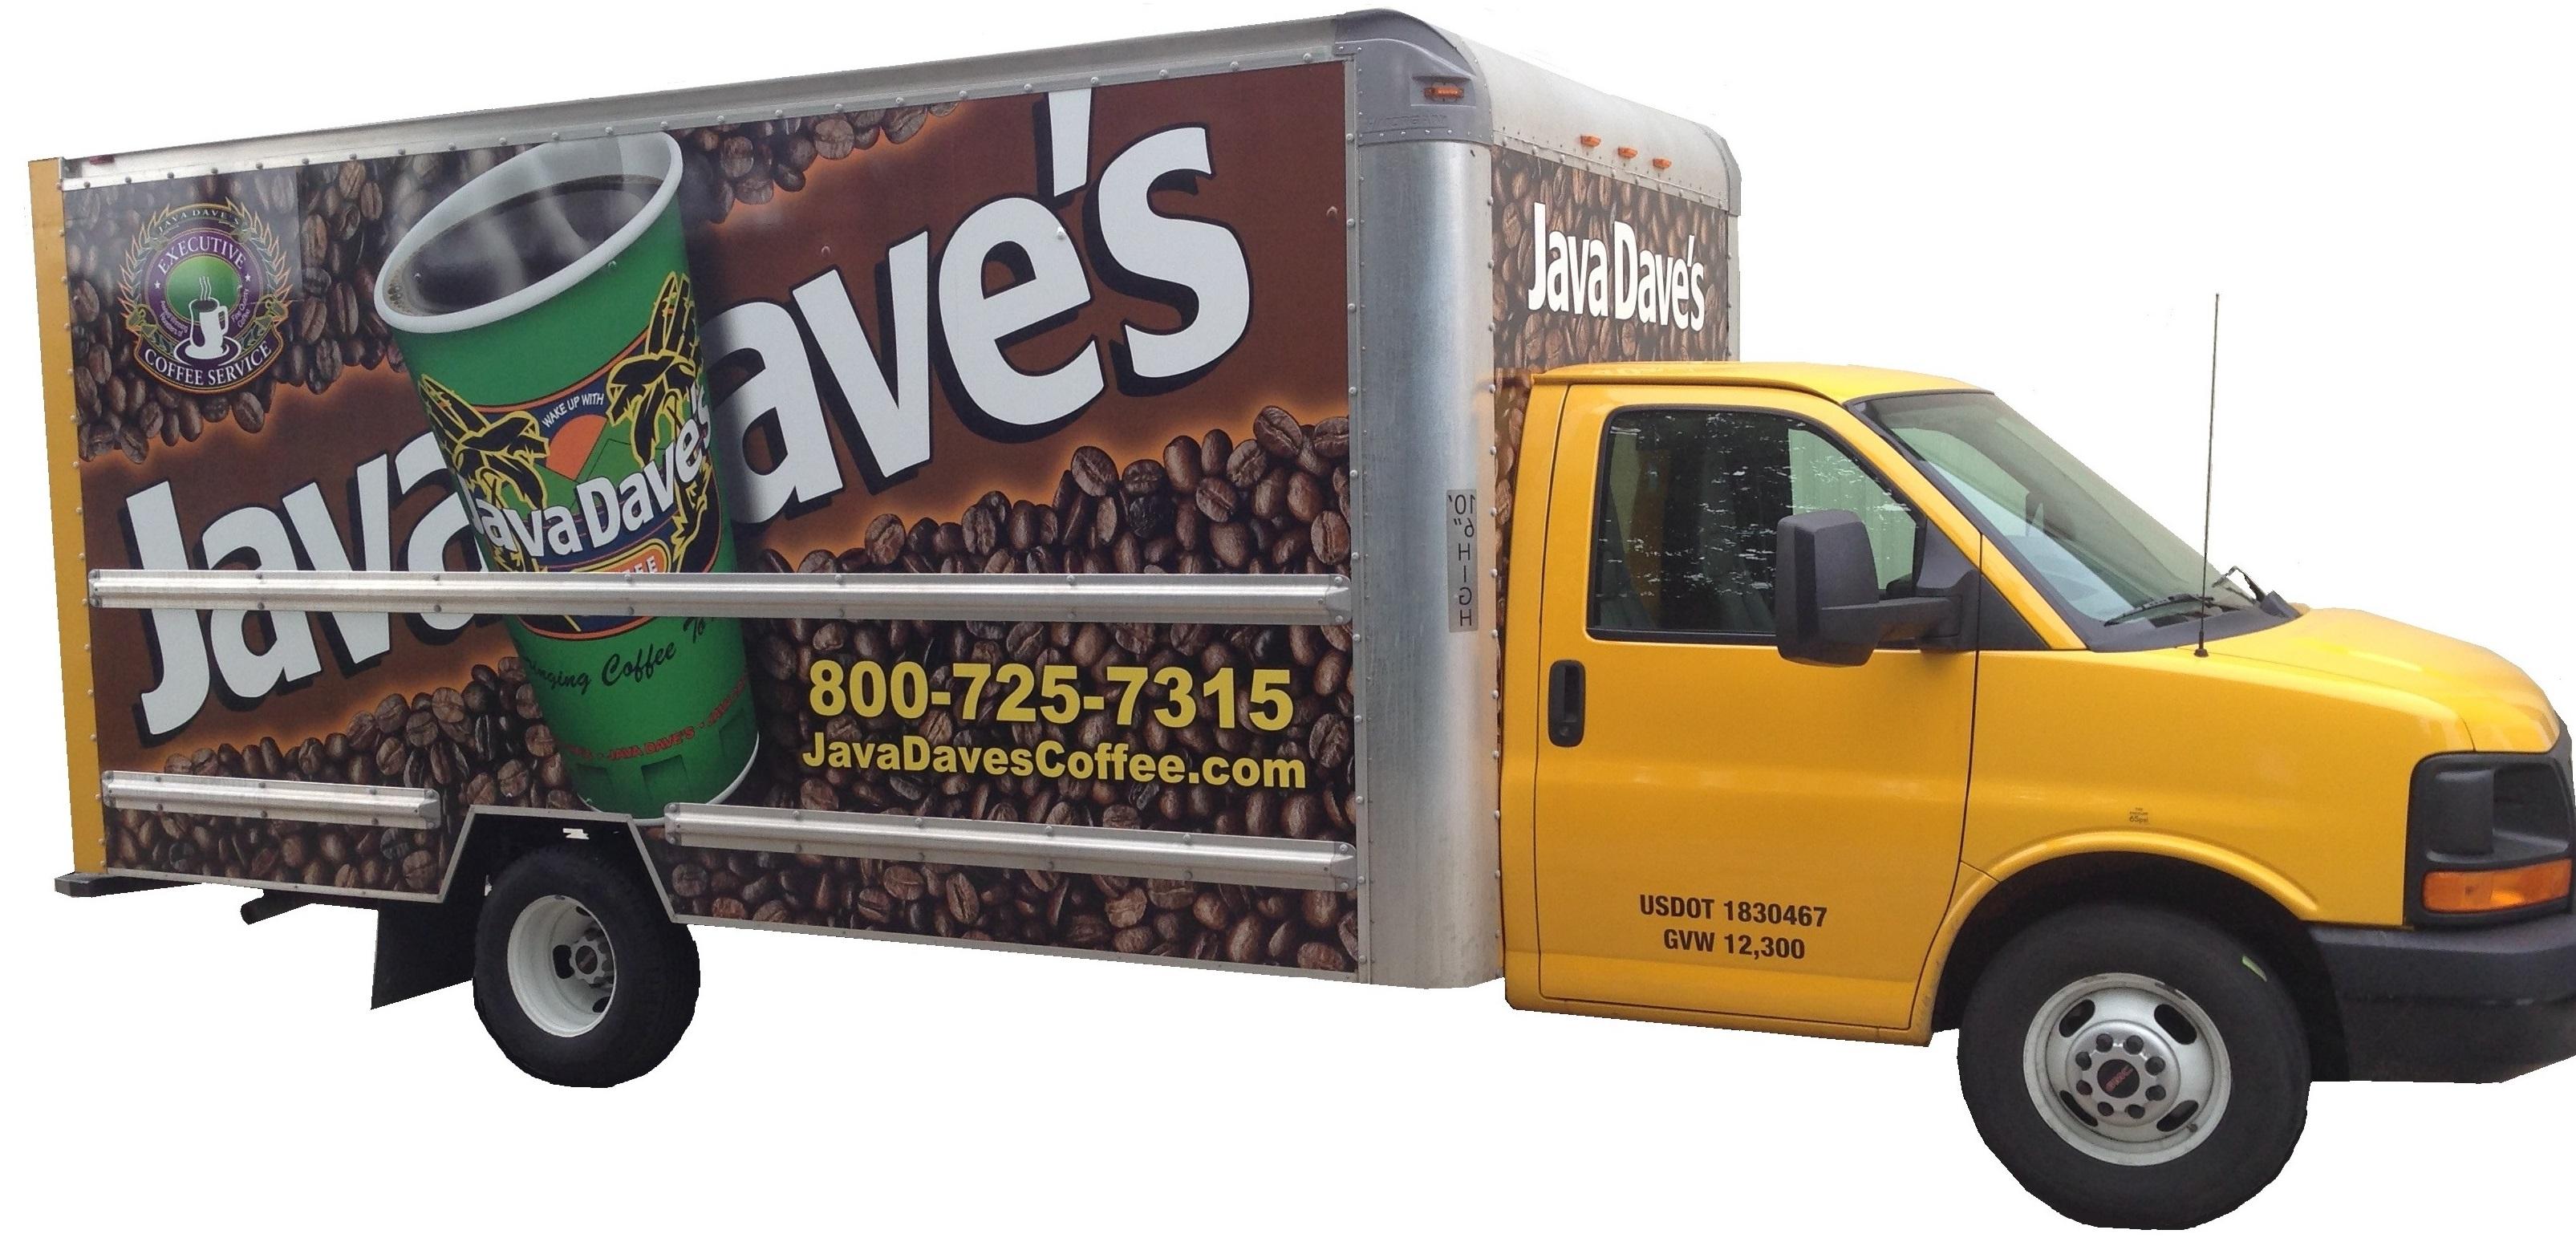 executive-coffee-service-truck-4.jpg